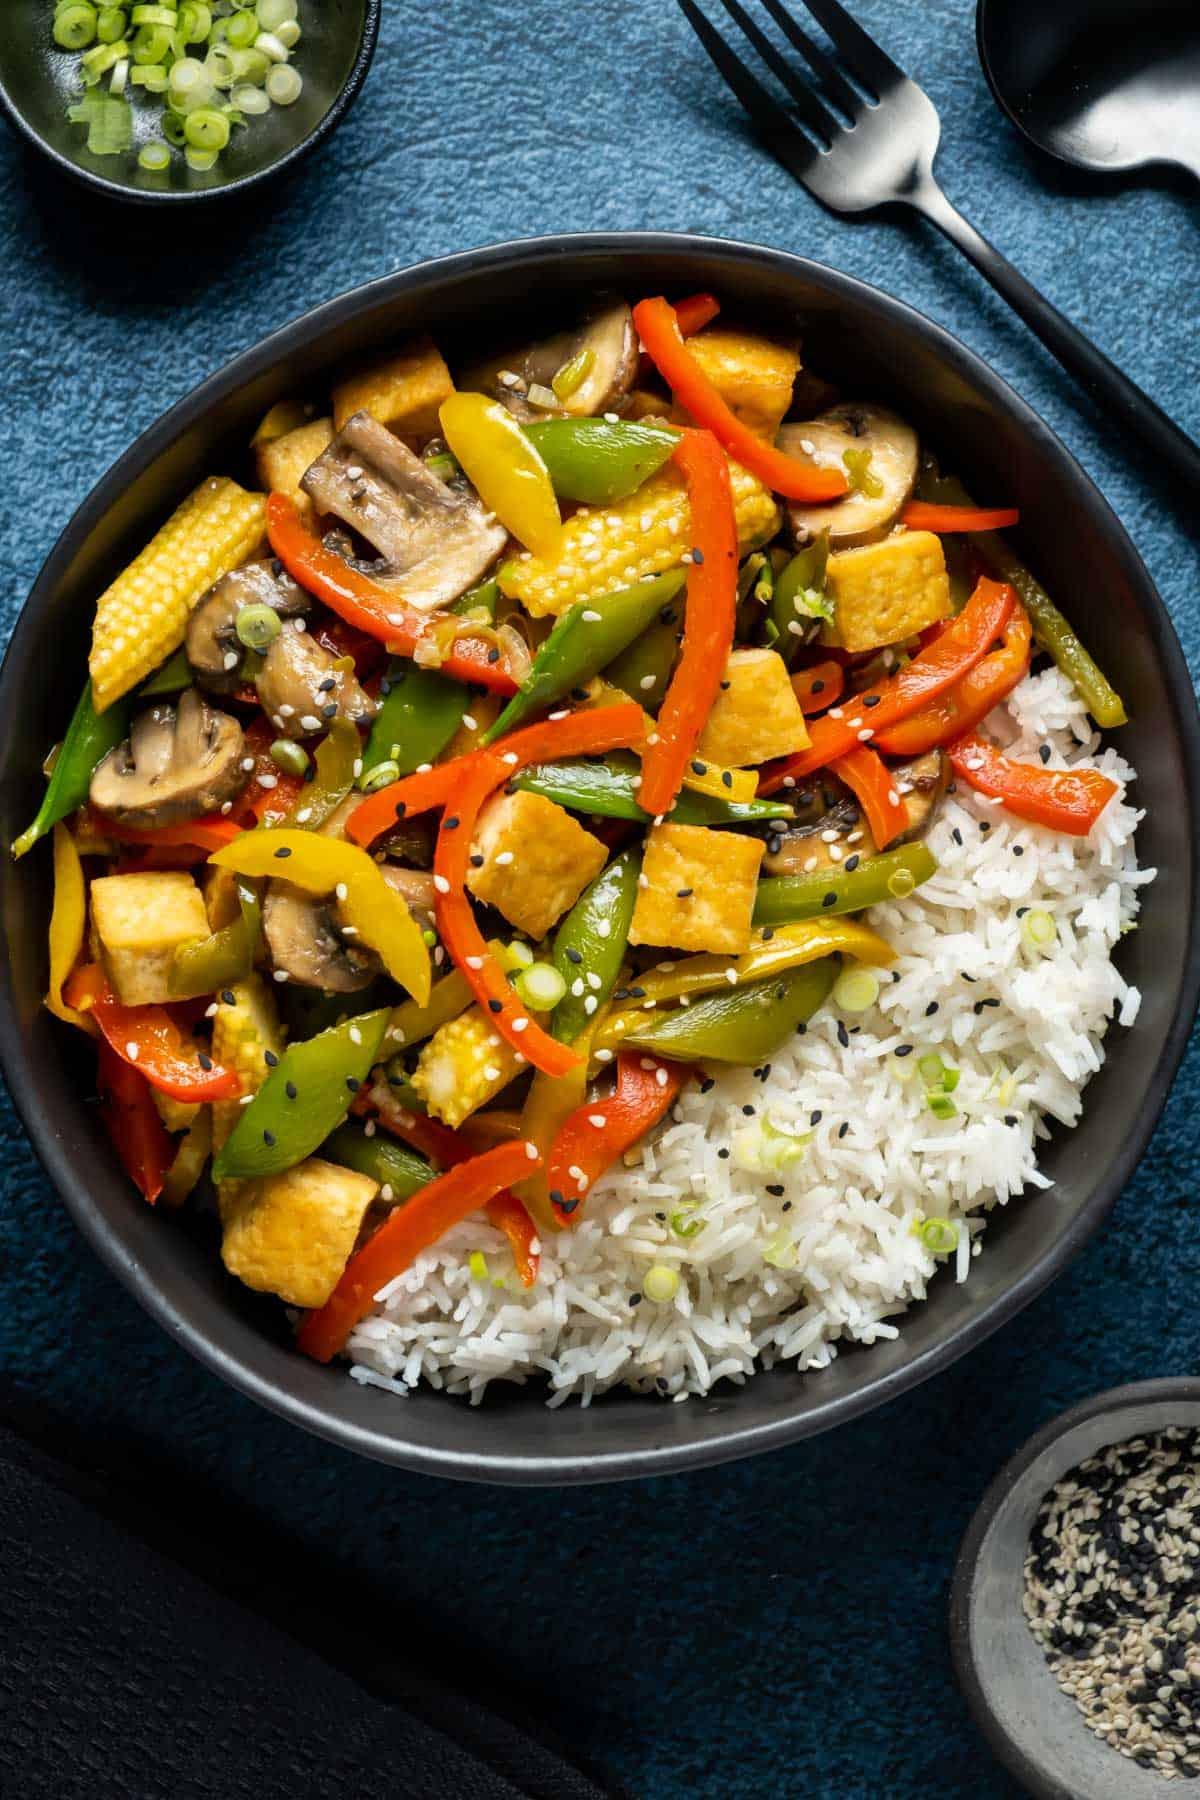 Vegan stir fry with rice in a black bowl.